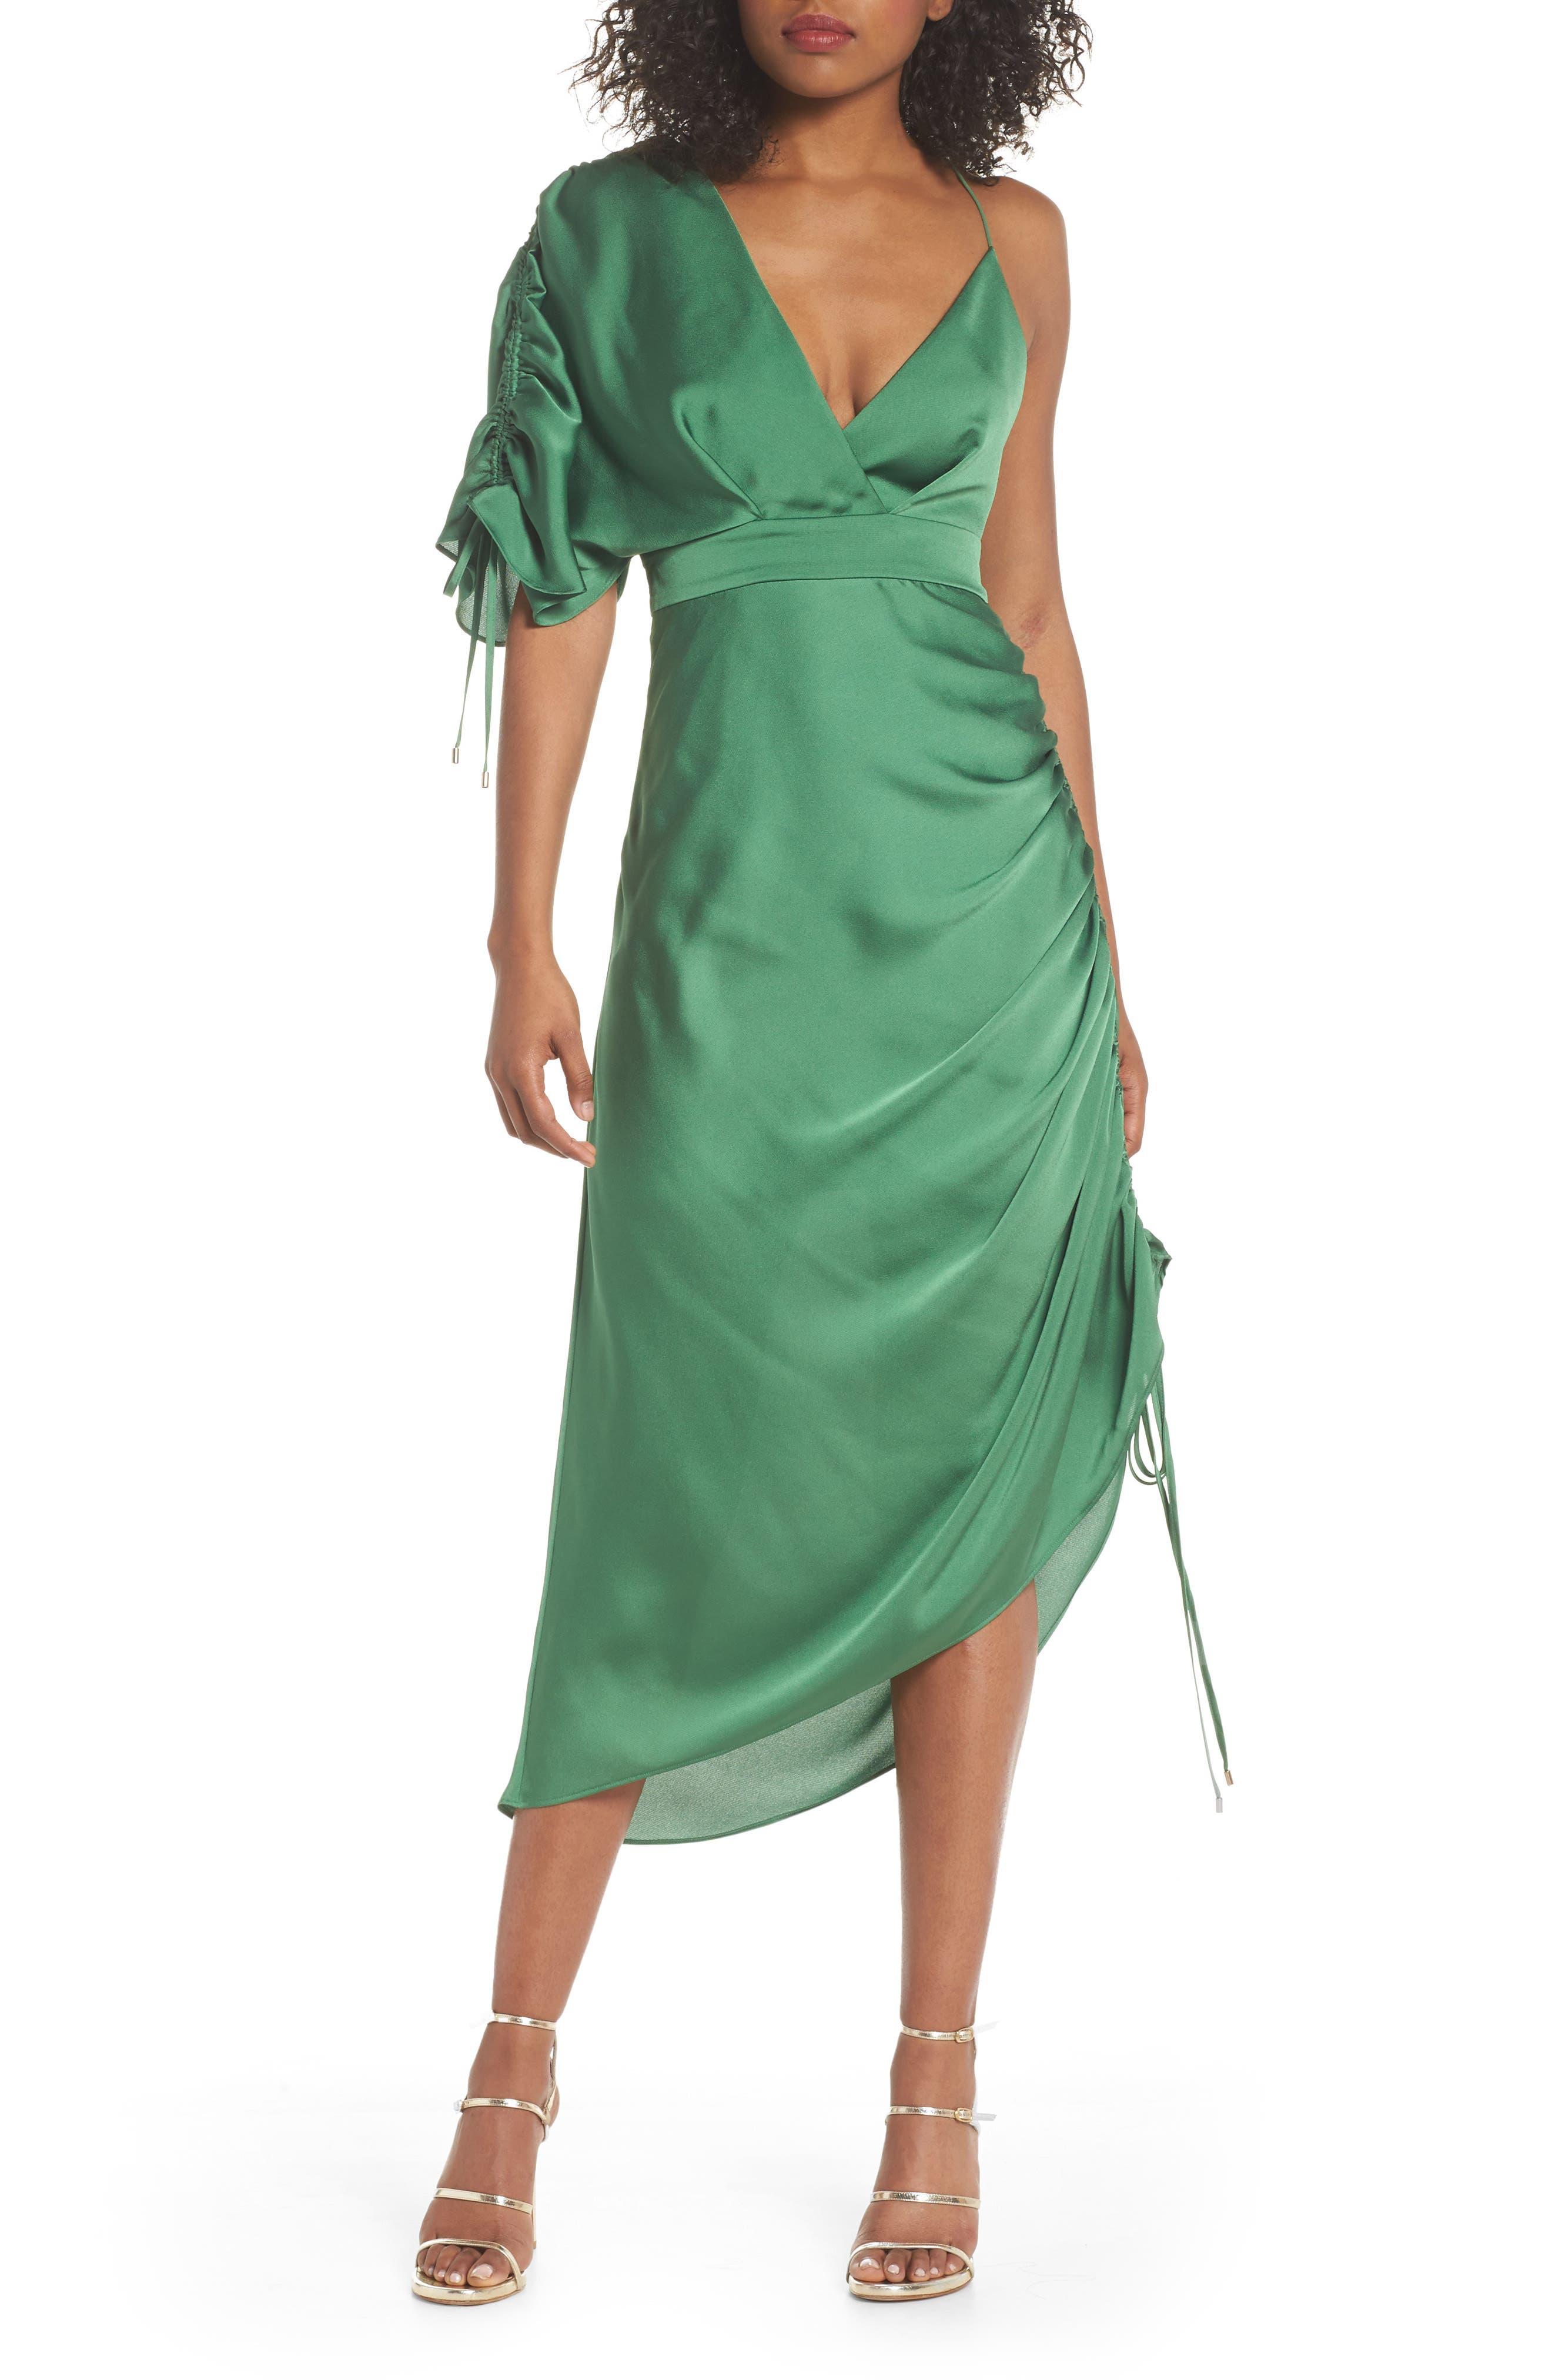 I've Got You Asymmetrical Satin Dress,                         Main,                         color, 310